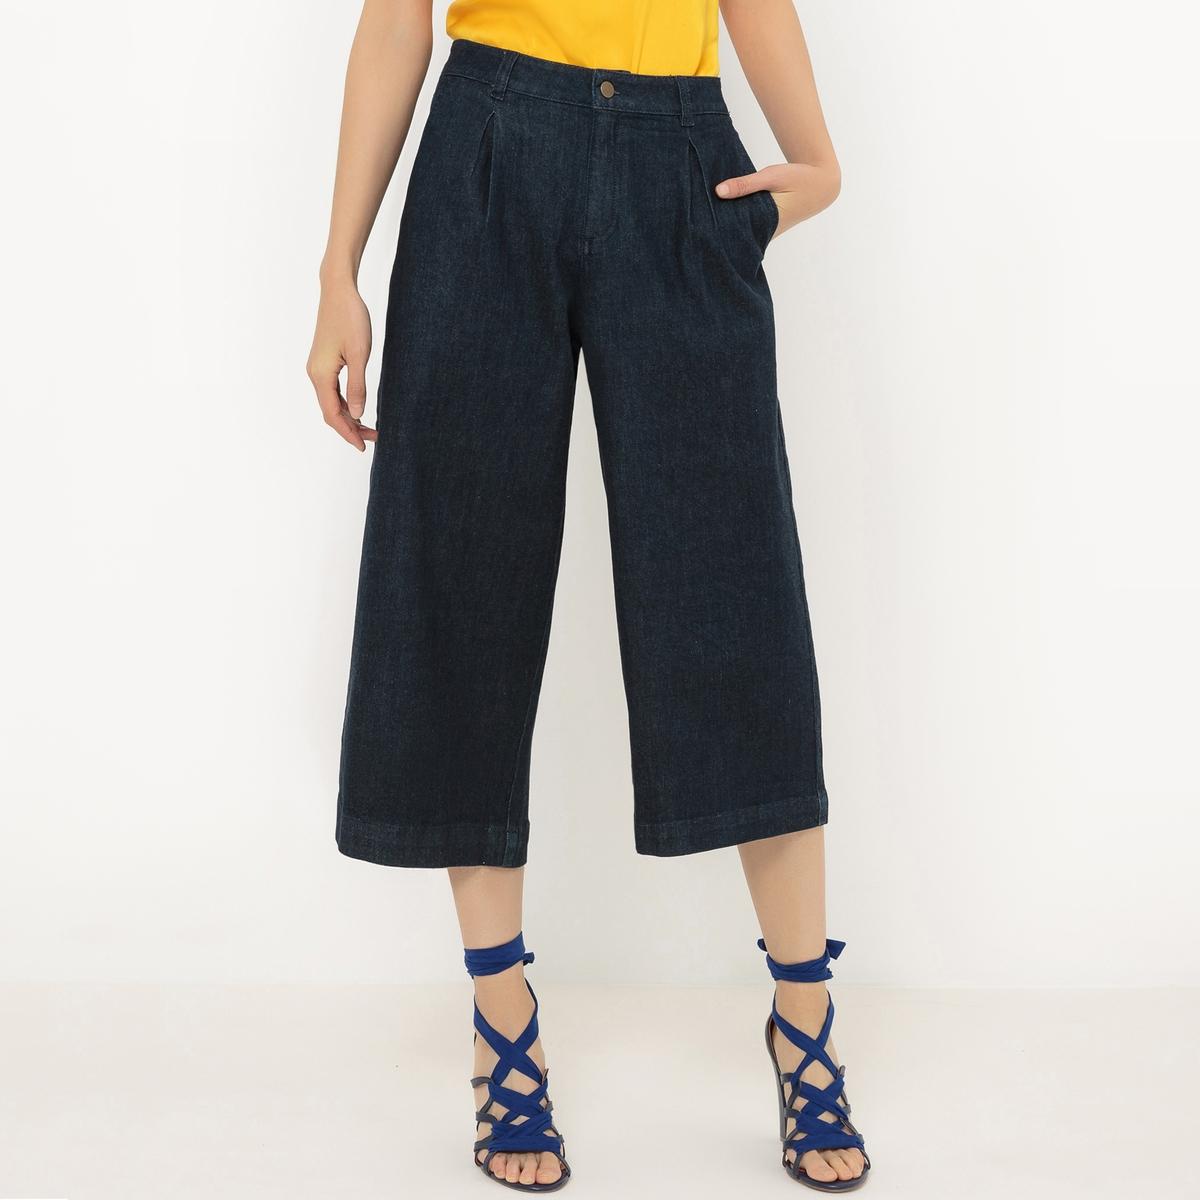 Юбка-брюки из денима от La Redoute